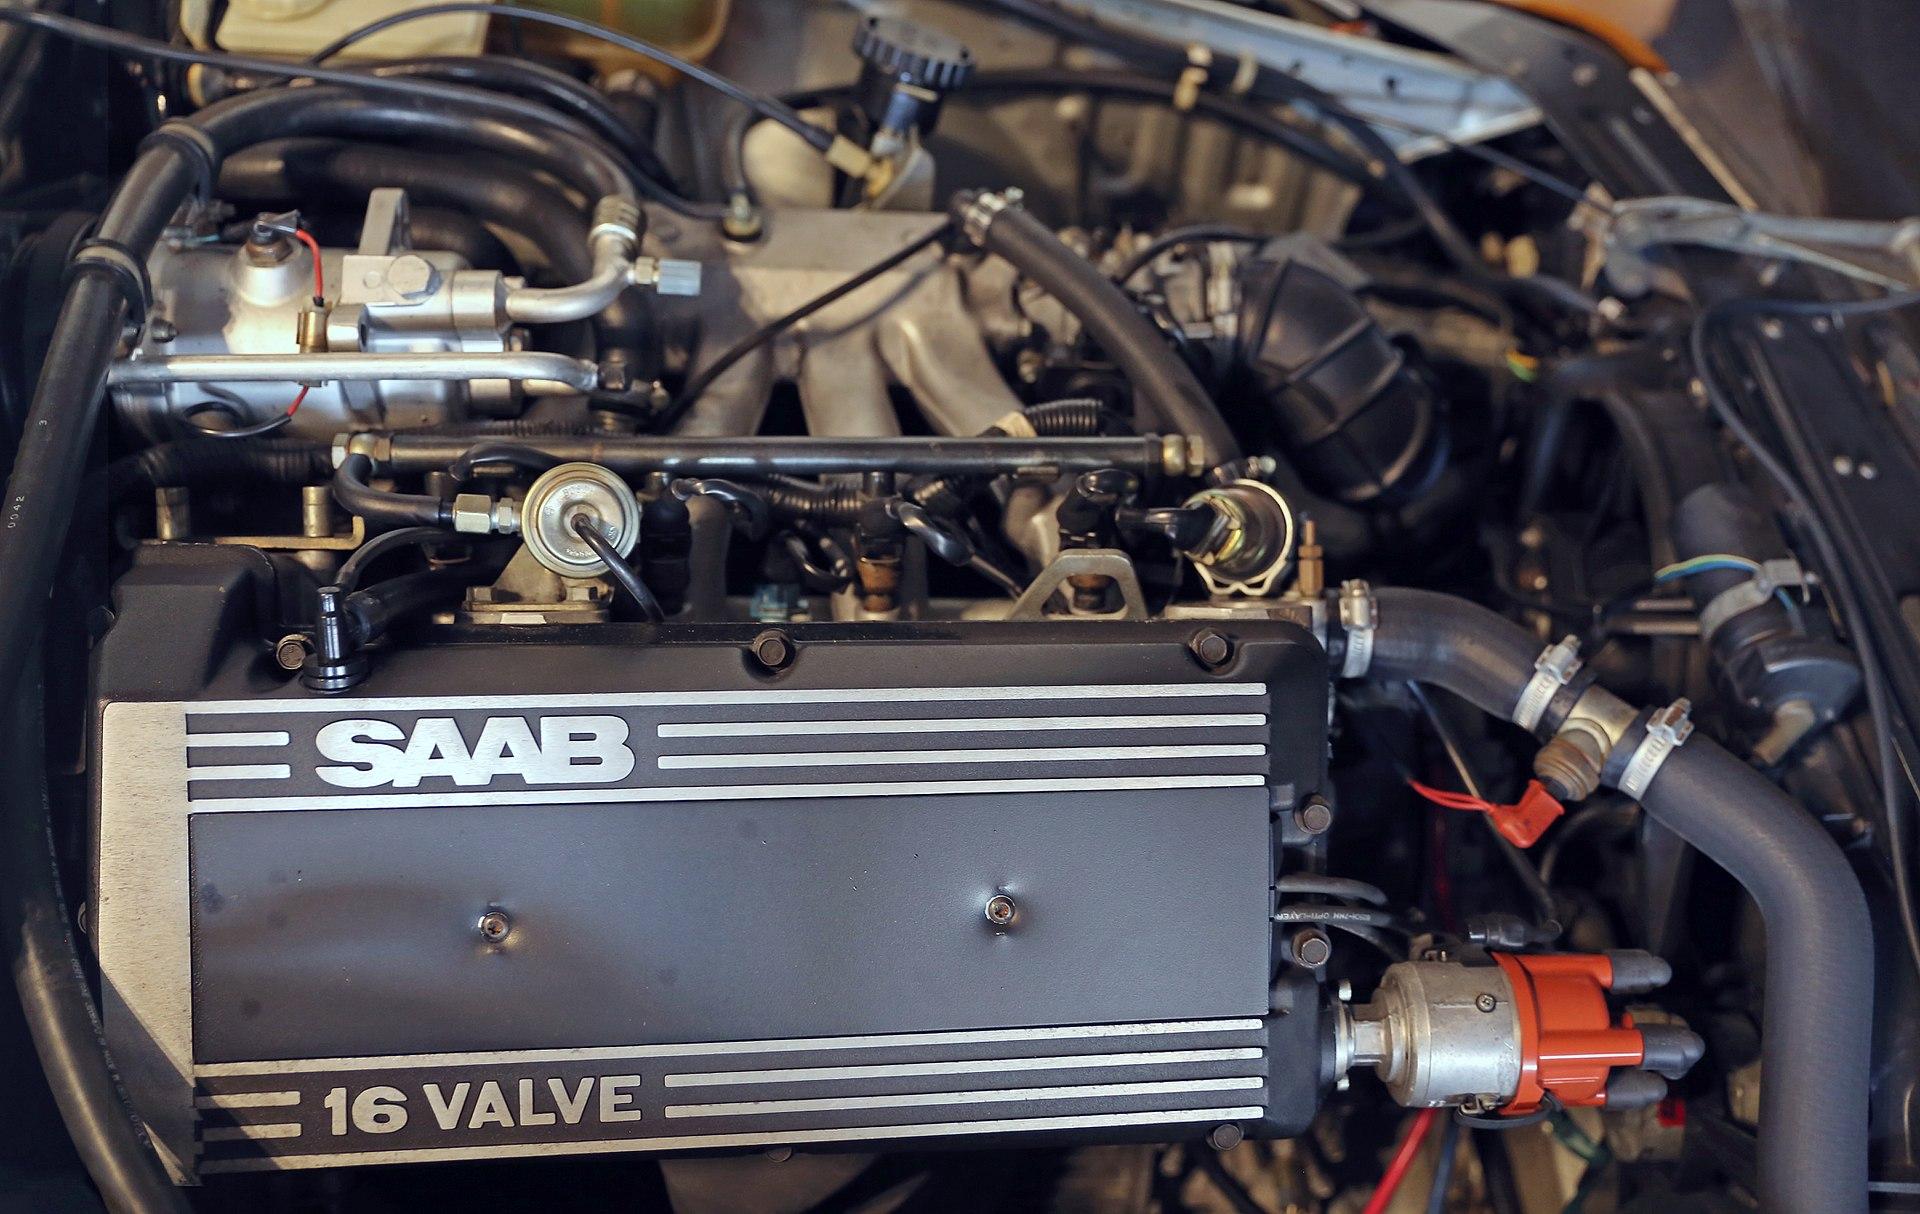 1920px-1986_Saab_B202_(na)_engine,_right_side  Volvo Turbo Engine Diagram on